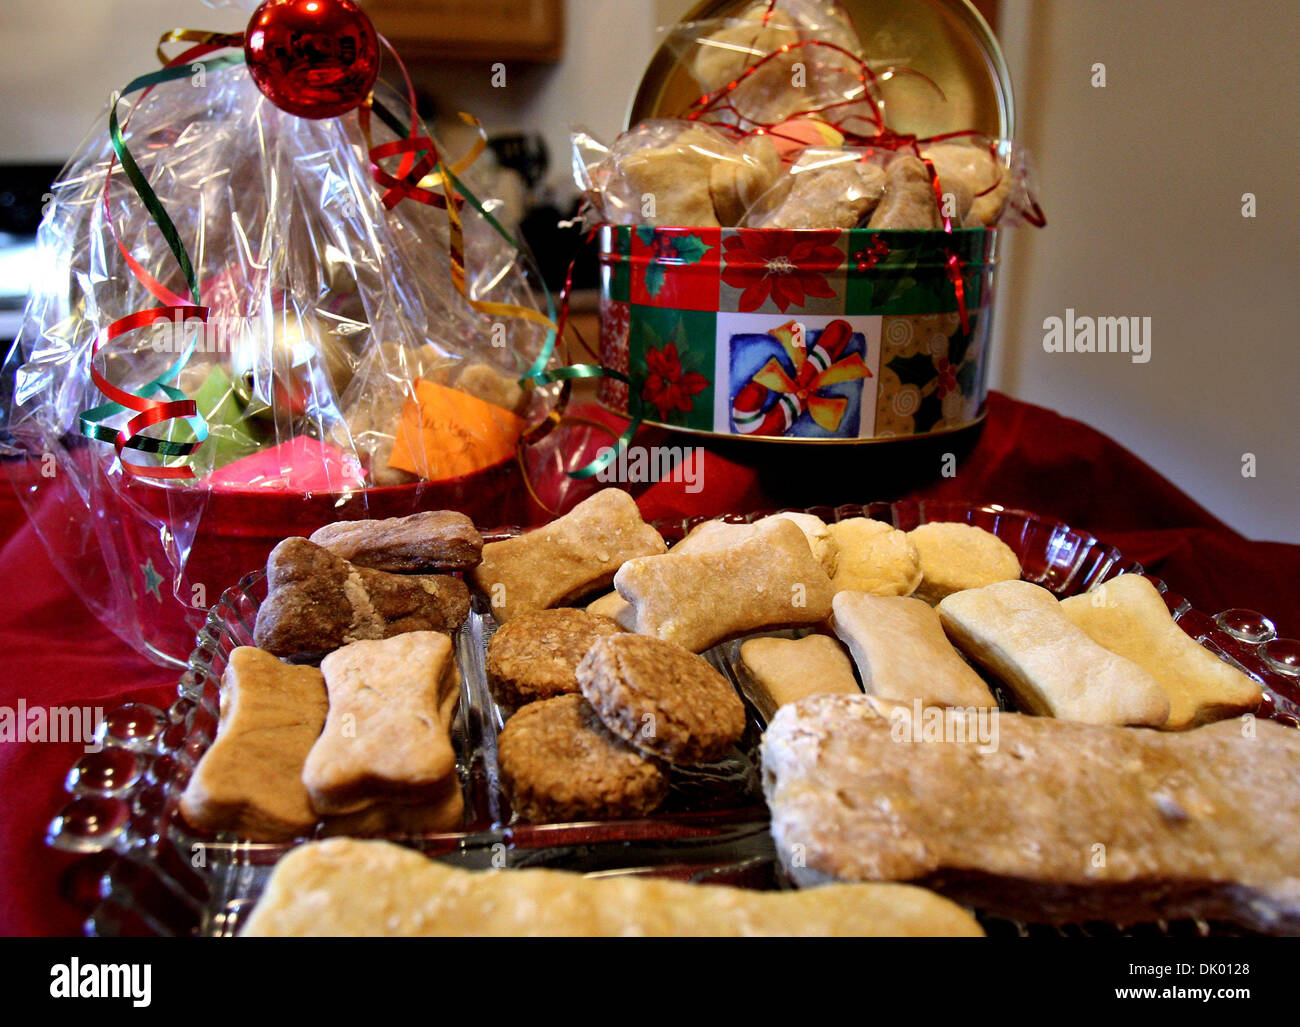 Dec. 15, 2010 - Nesbit, MS, U.S. - December 3, 2010 - After losing her job, Deborah Brown began making gourmet dog Stock Photo